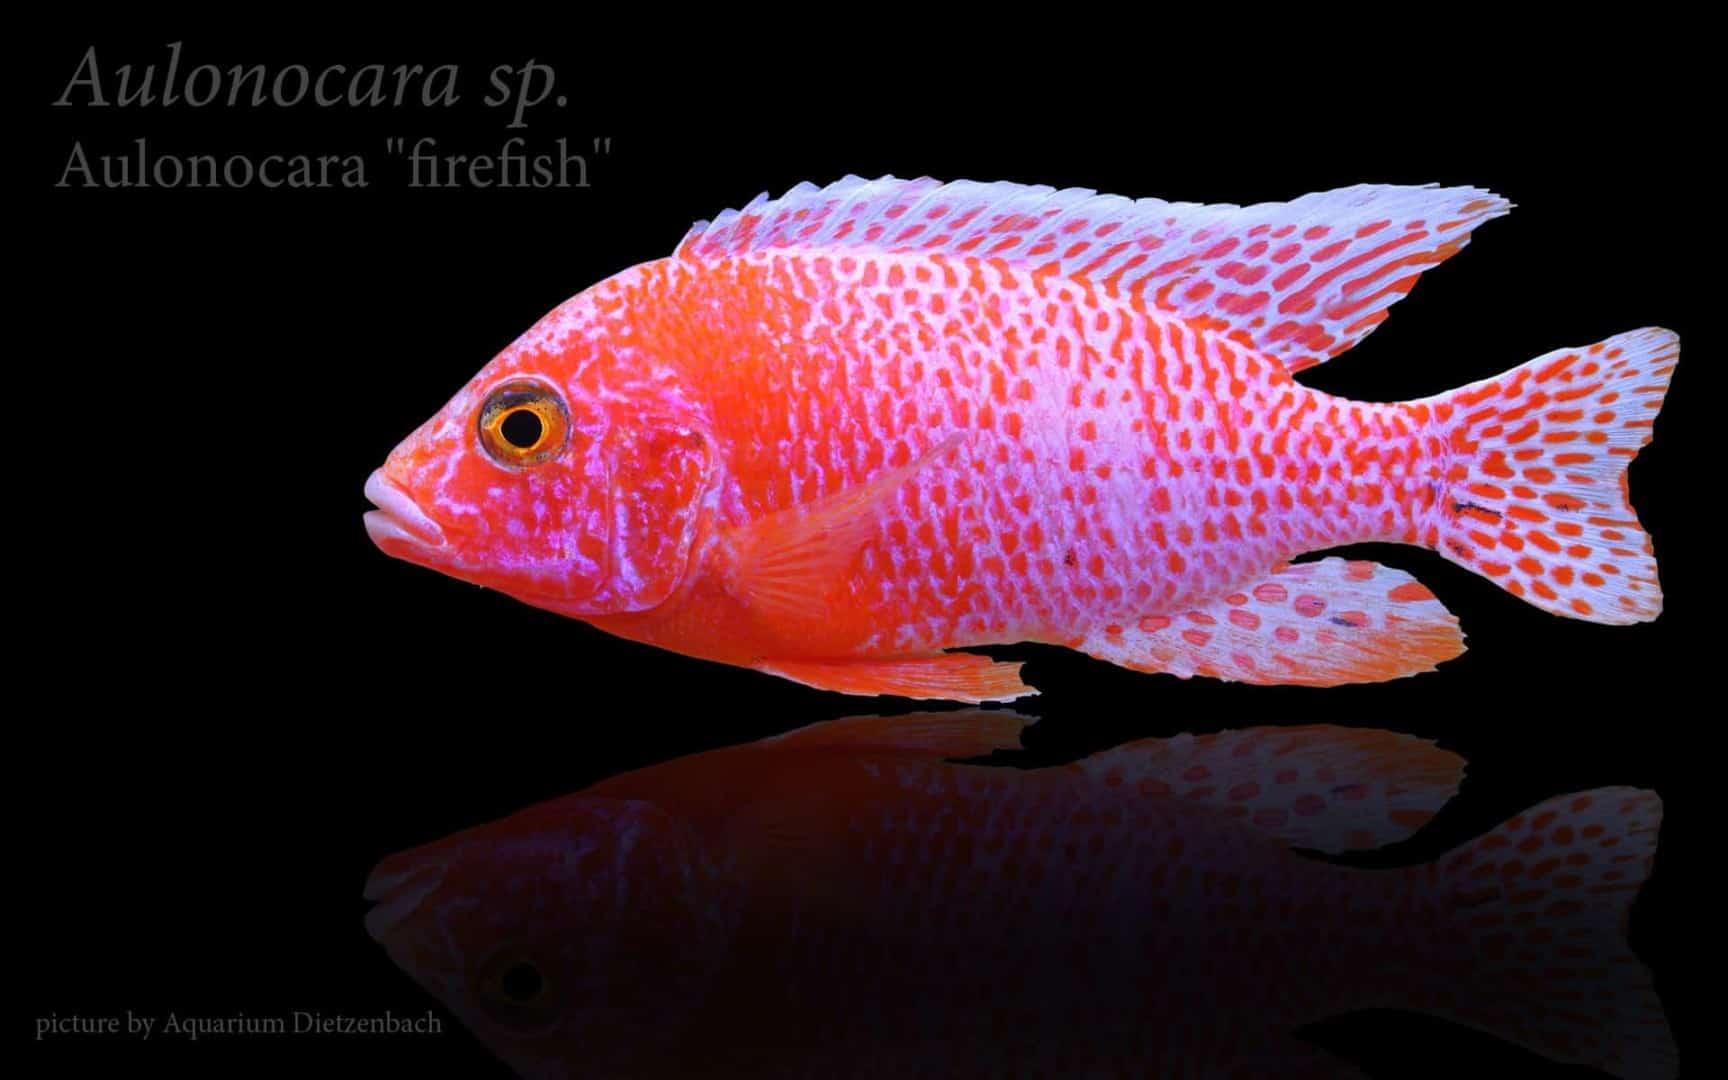 "Aulonocara seifert ""firefish"" 4"